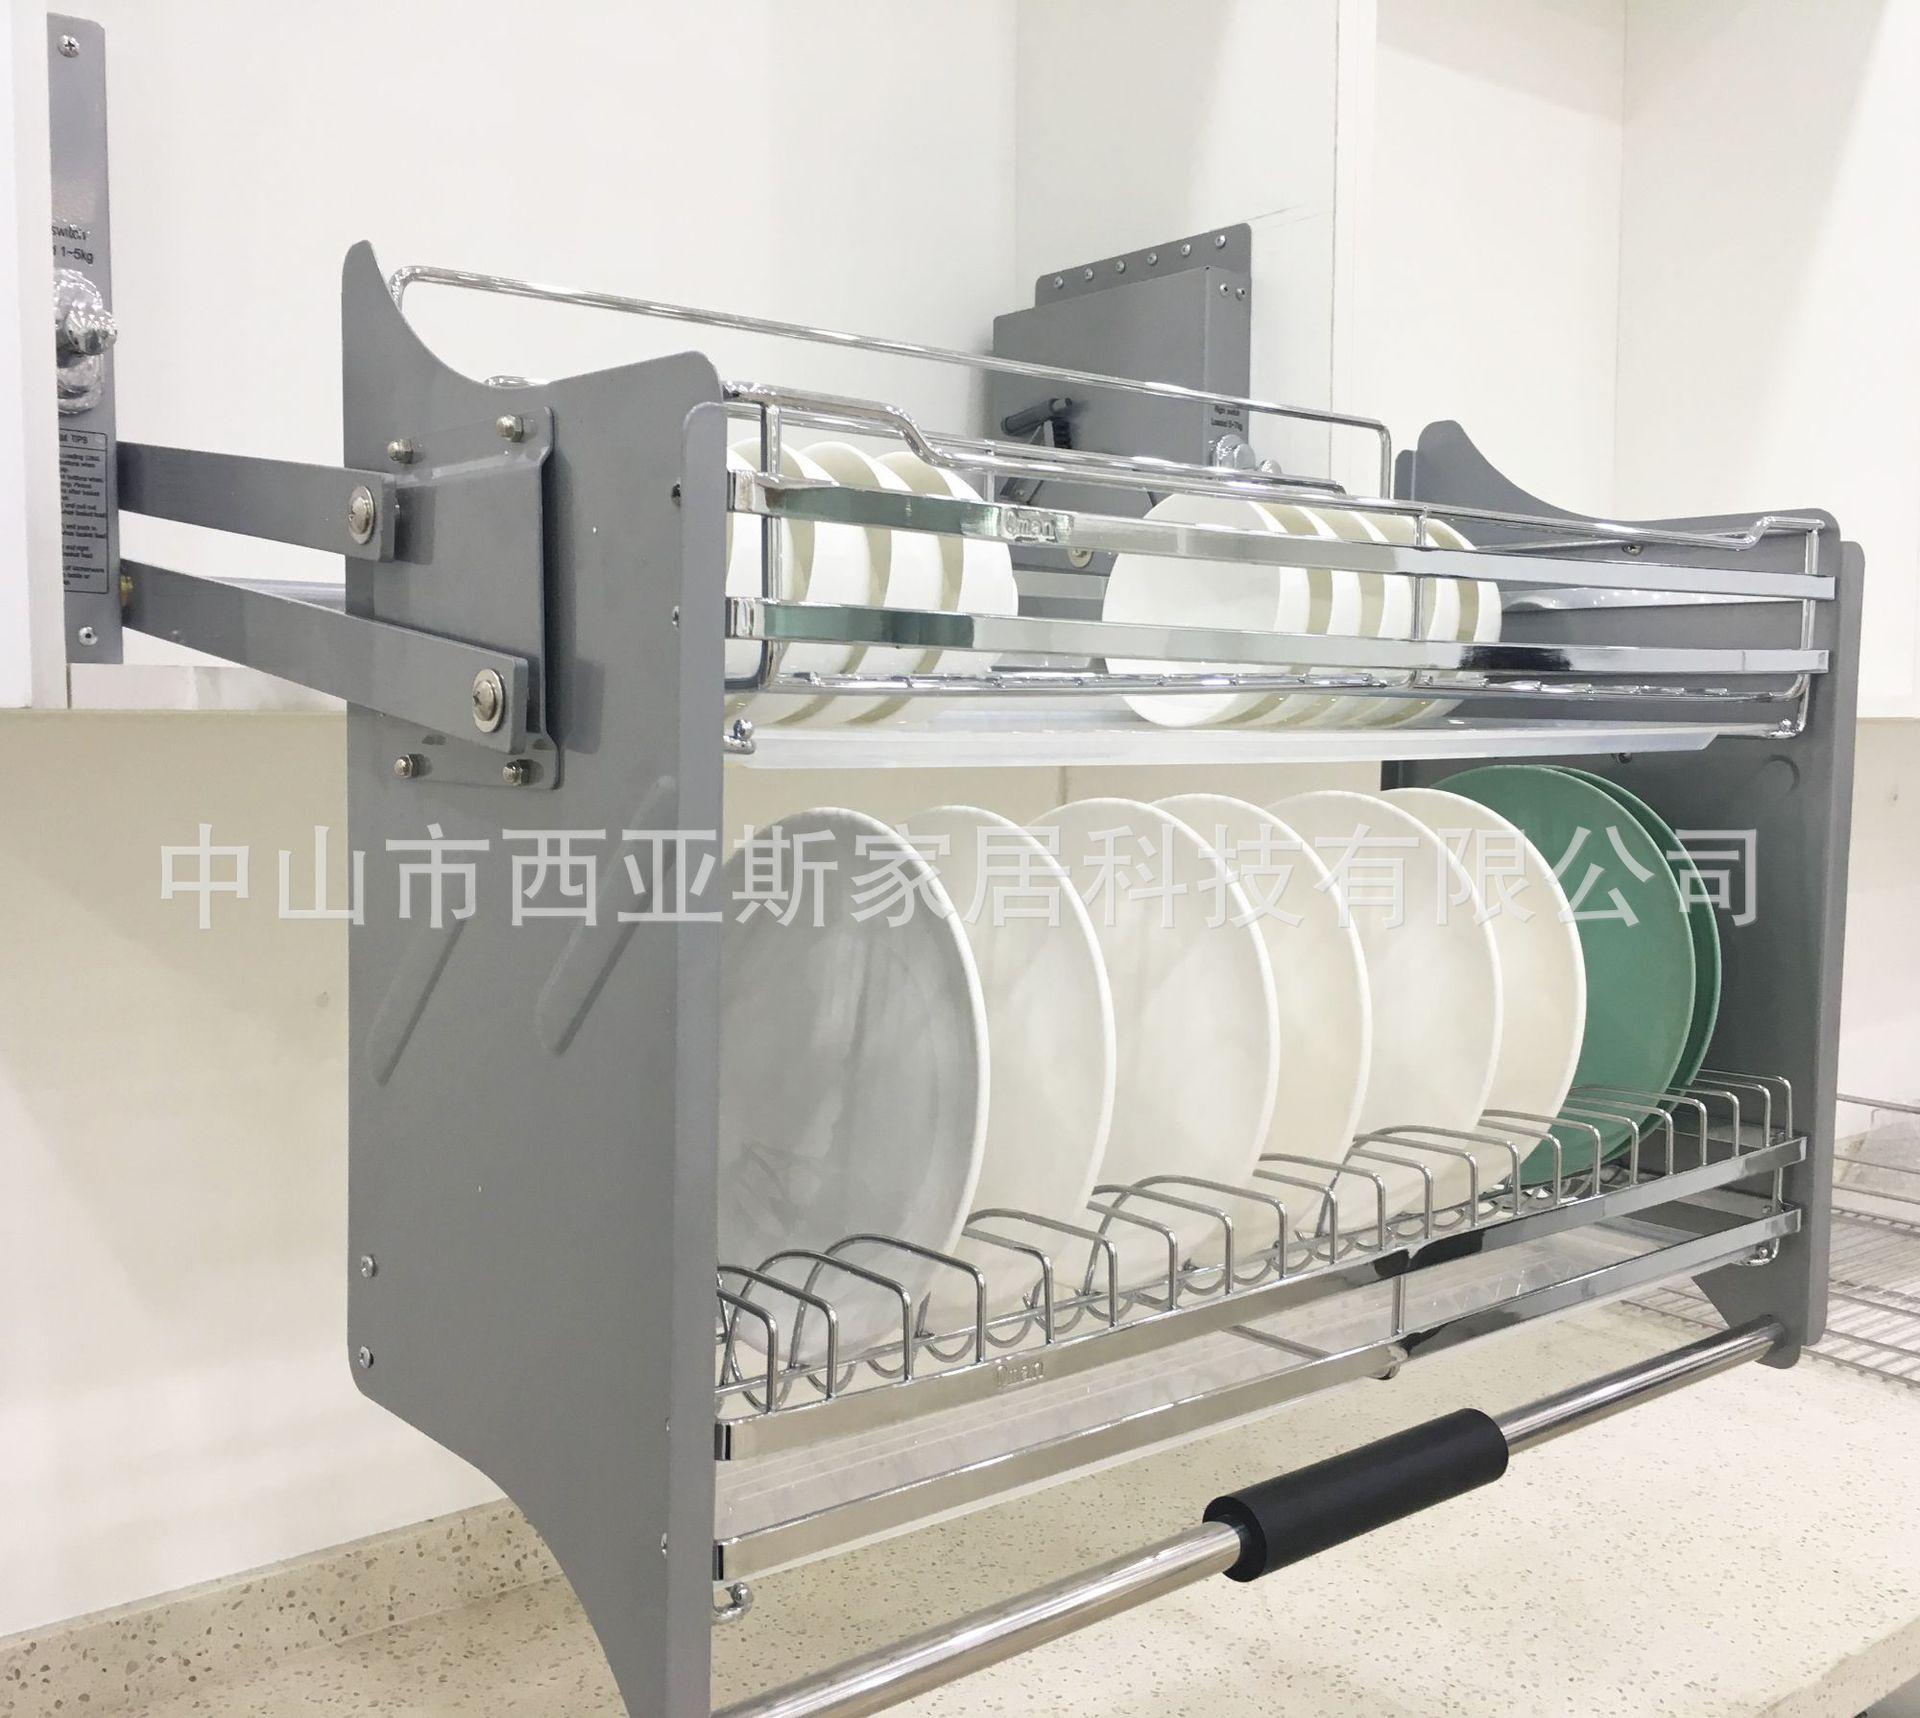 Segment Descent Stainless Steel Adjustable Intensity Lift Cabinet Dishes Basket Hanging Cabinet Lifting Basket